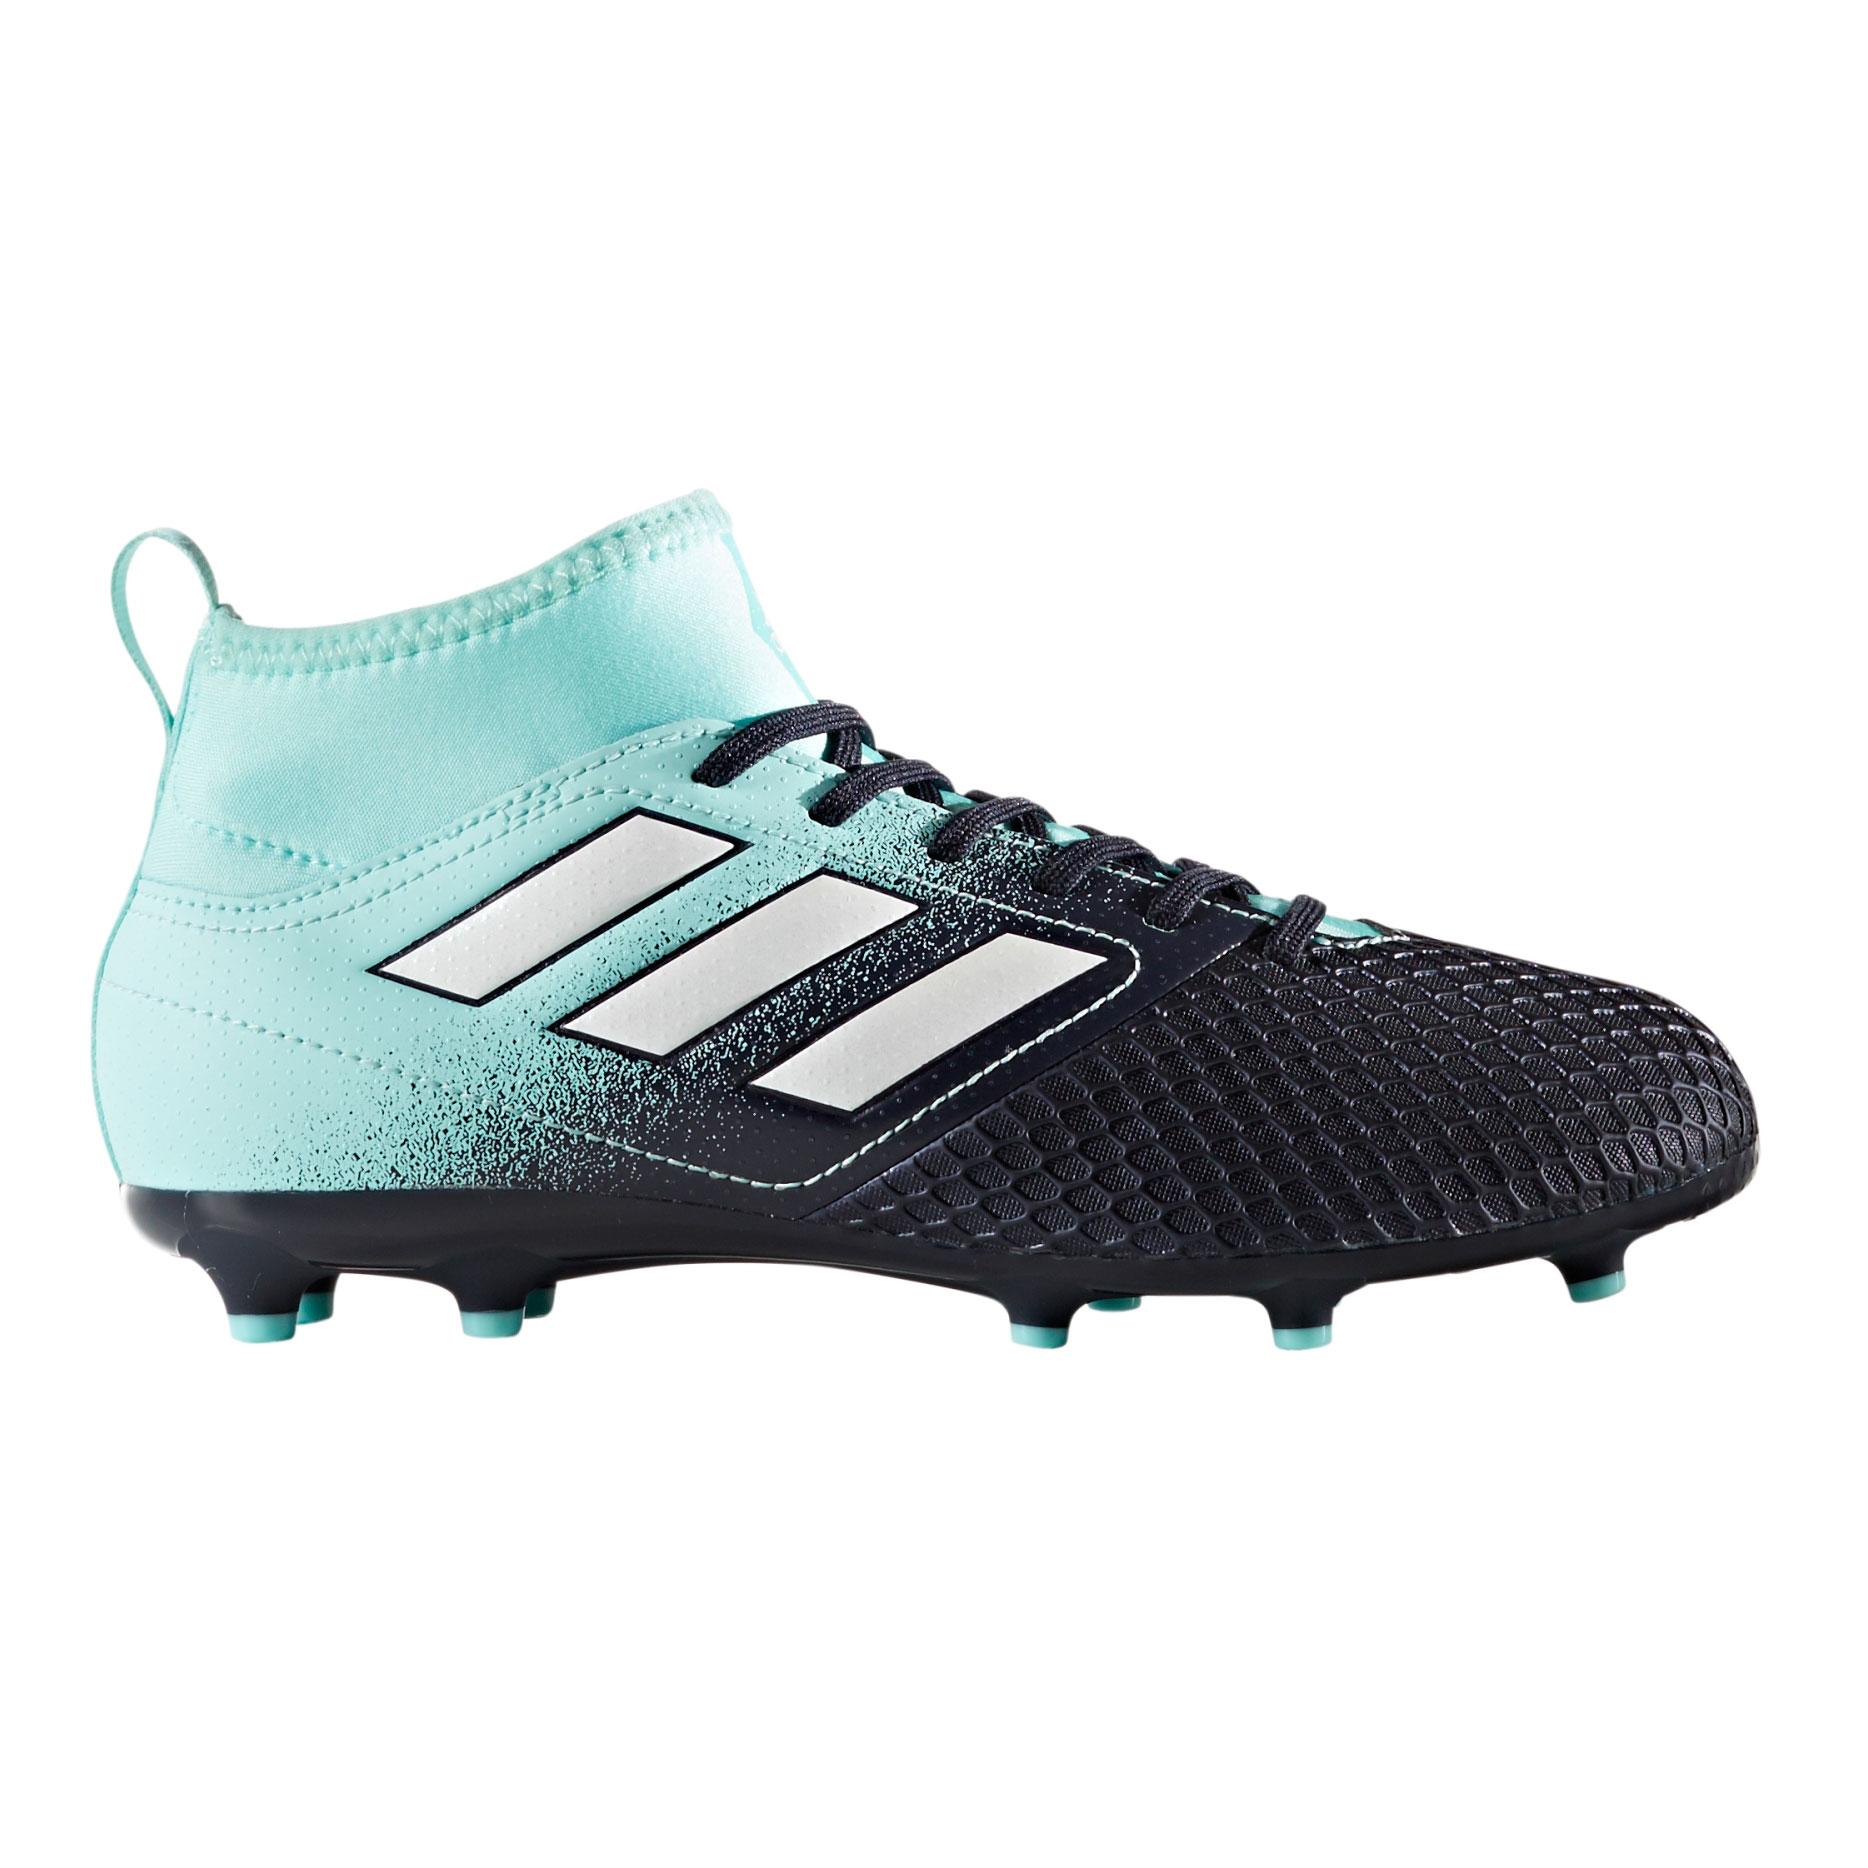 Afbeelding van Adidas Ace 17.3 FG S77068 Voetbalschoenen Junior Energy Aqua Footwear White Legend Ink